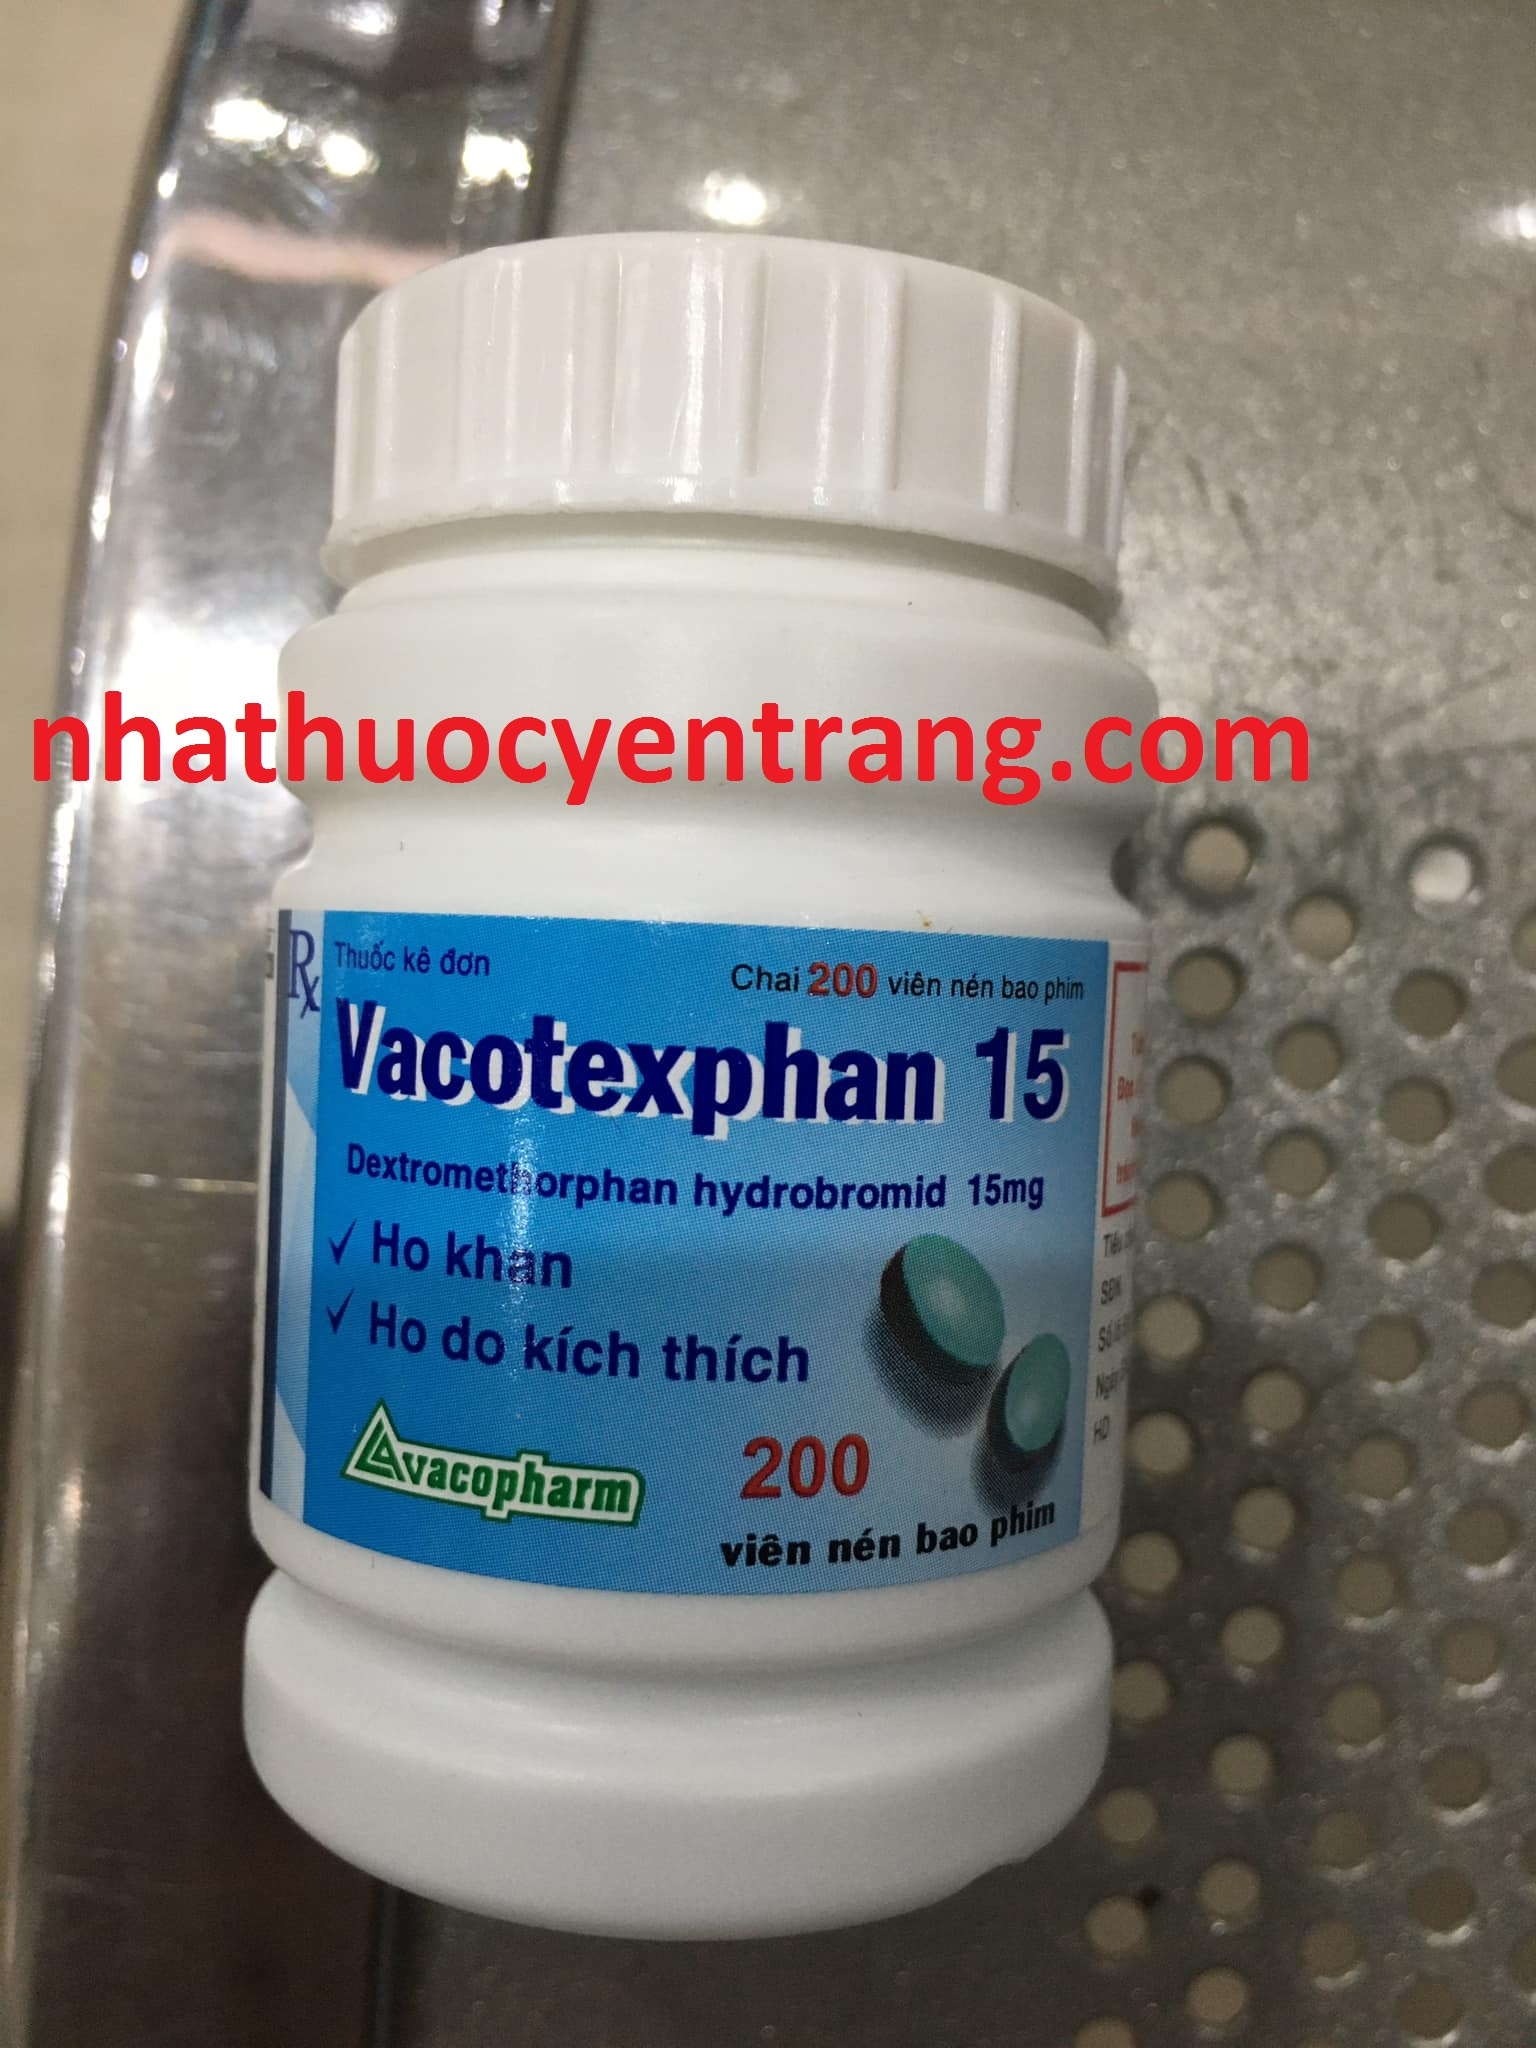 Vacotexphan 15